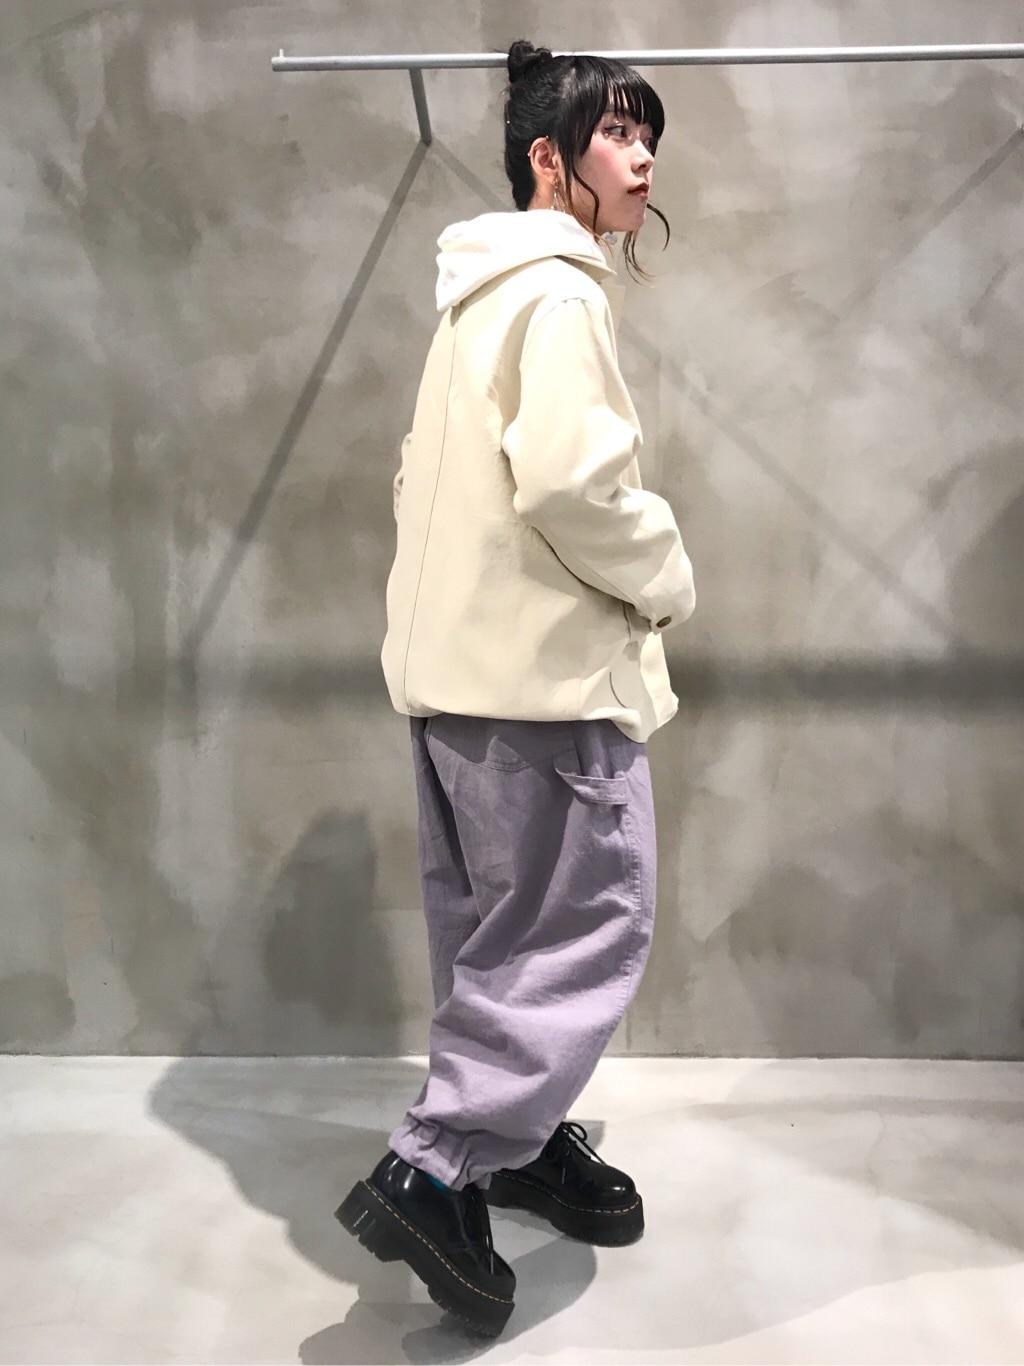 bulle de savon 渋谷スクランブルスクエア 身長:153cm 2020.03.24